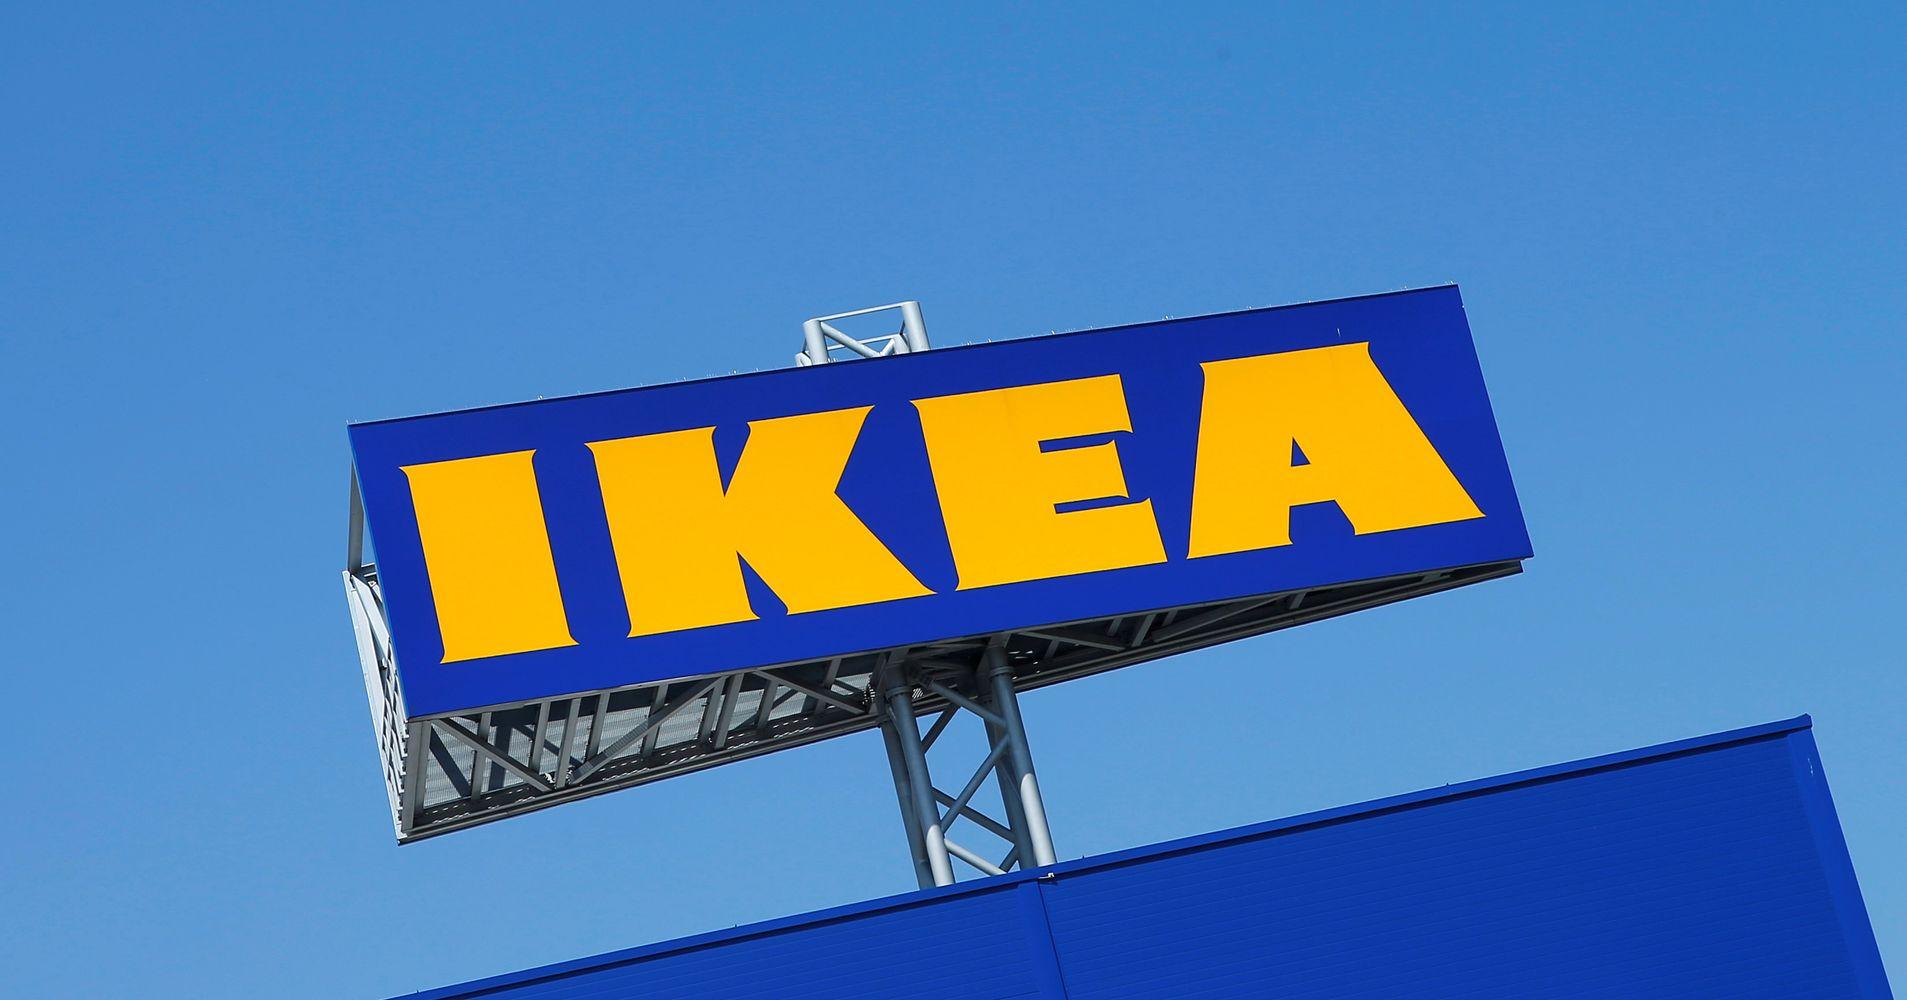 Handtuchständer Ikea ikea plans to sell furniture through third like amazon huffpost